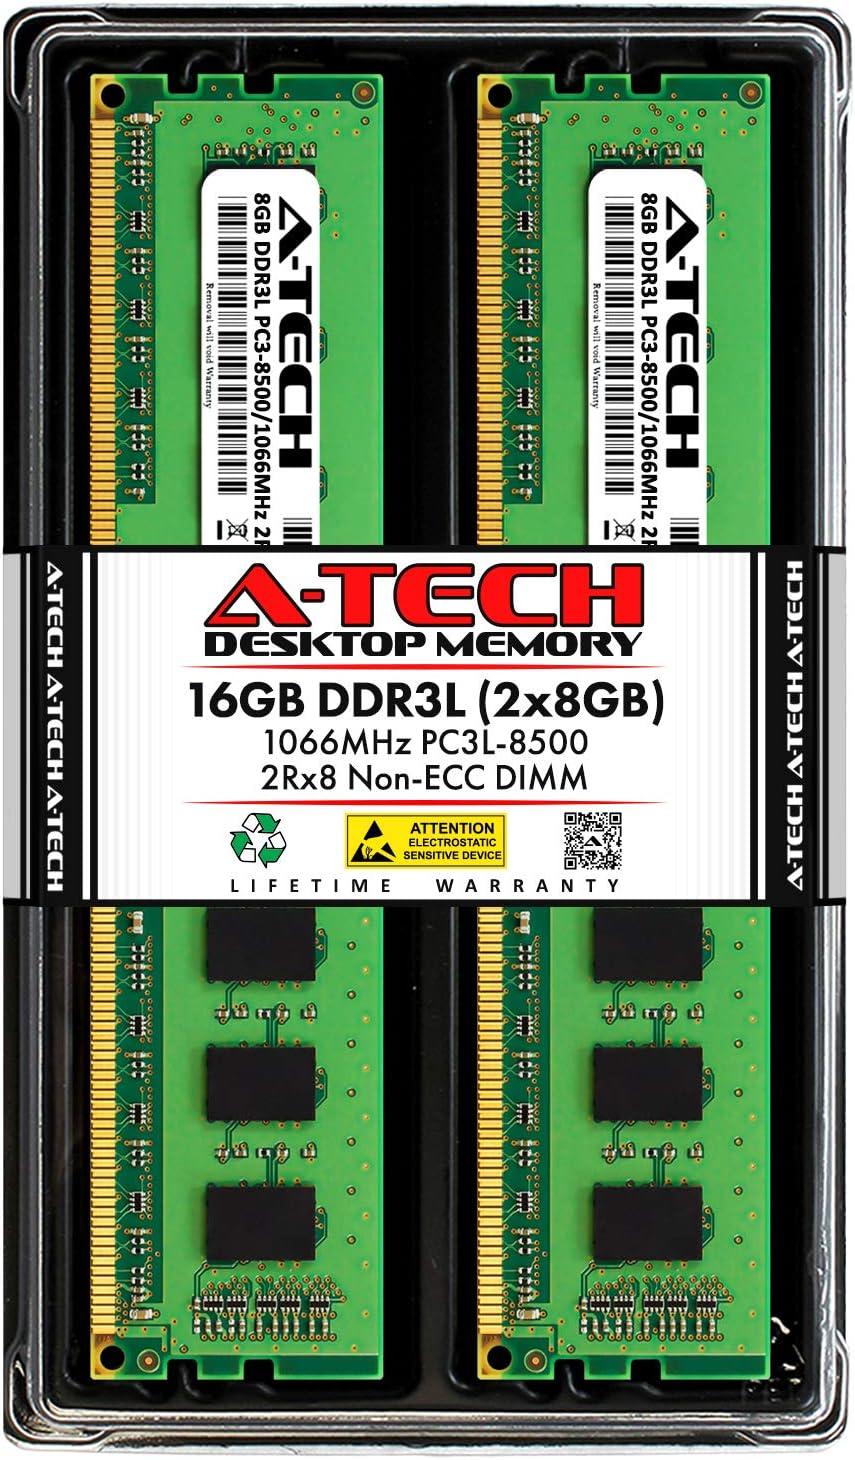 A-Tech 16GB DDR3 / DDR3L 1066MHz Desktop Memory Kit (2 x 8GB) PC3-8500 Non-ECC Unbuffered DIMM 240-Pin 2Rx8 1.35V Low Voltage Dual Rank Computer RAM Upgrade Sticks